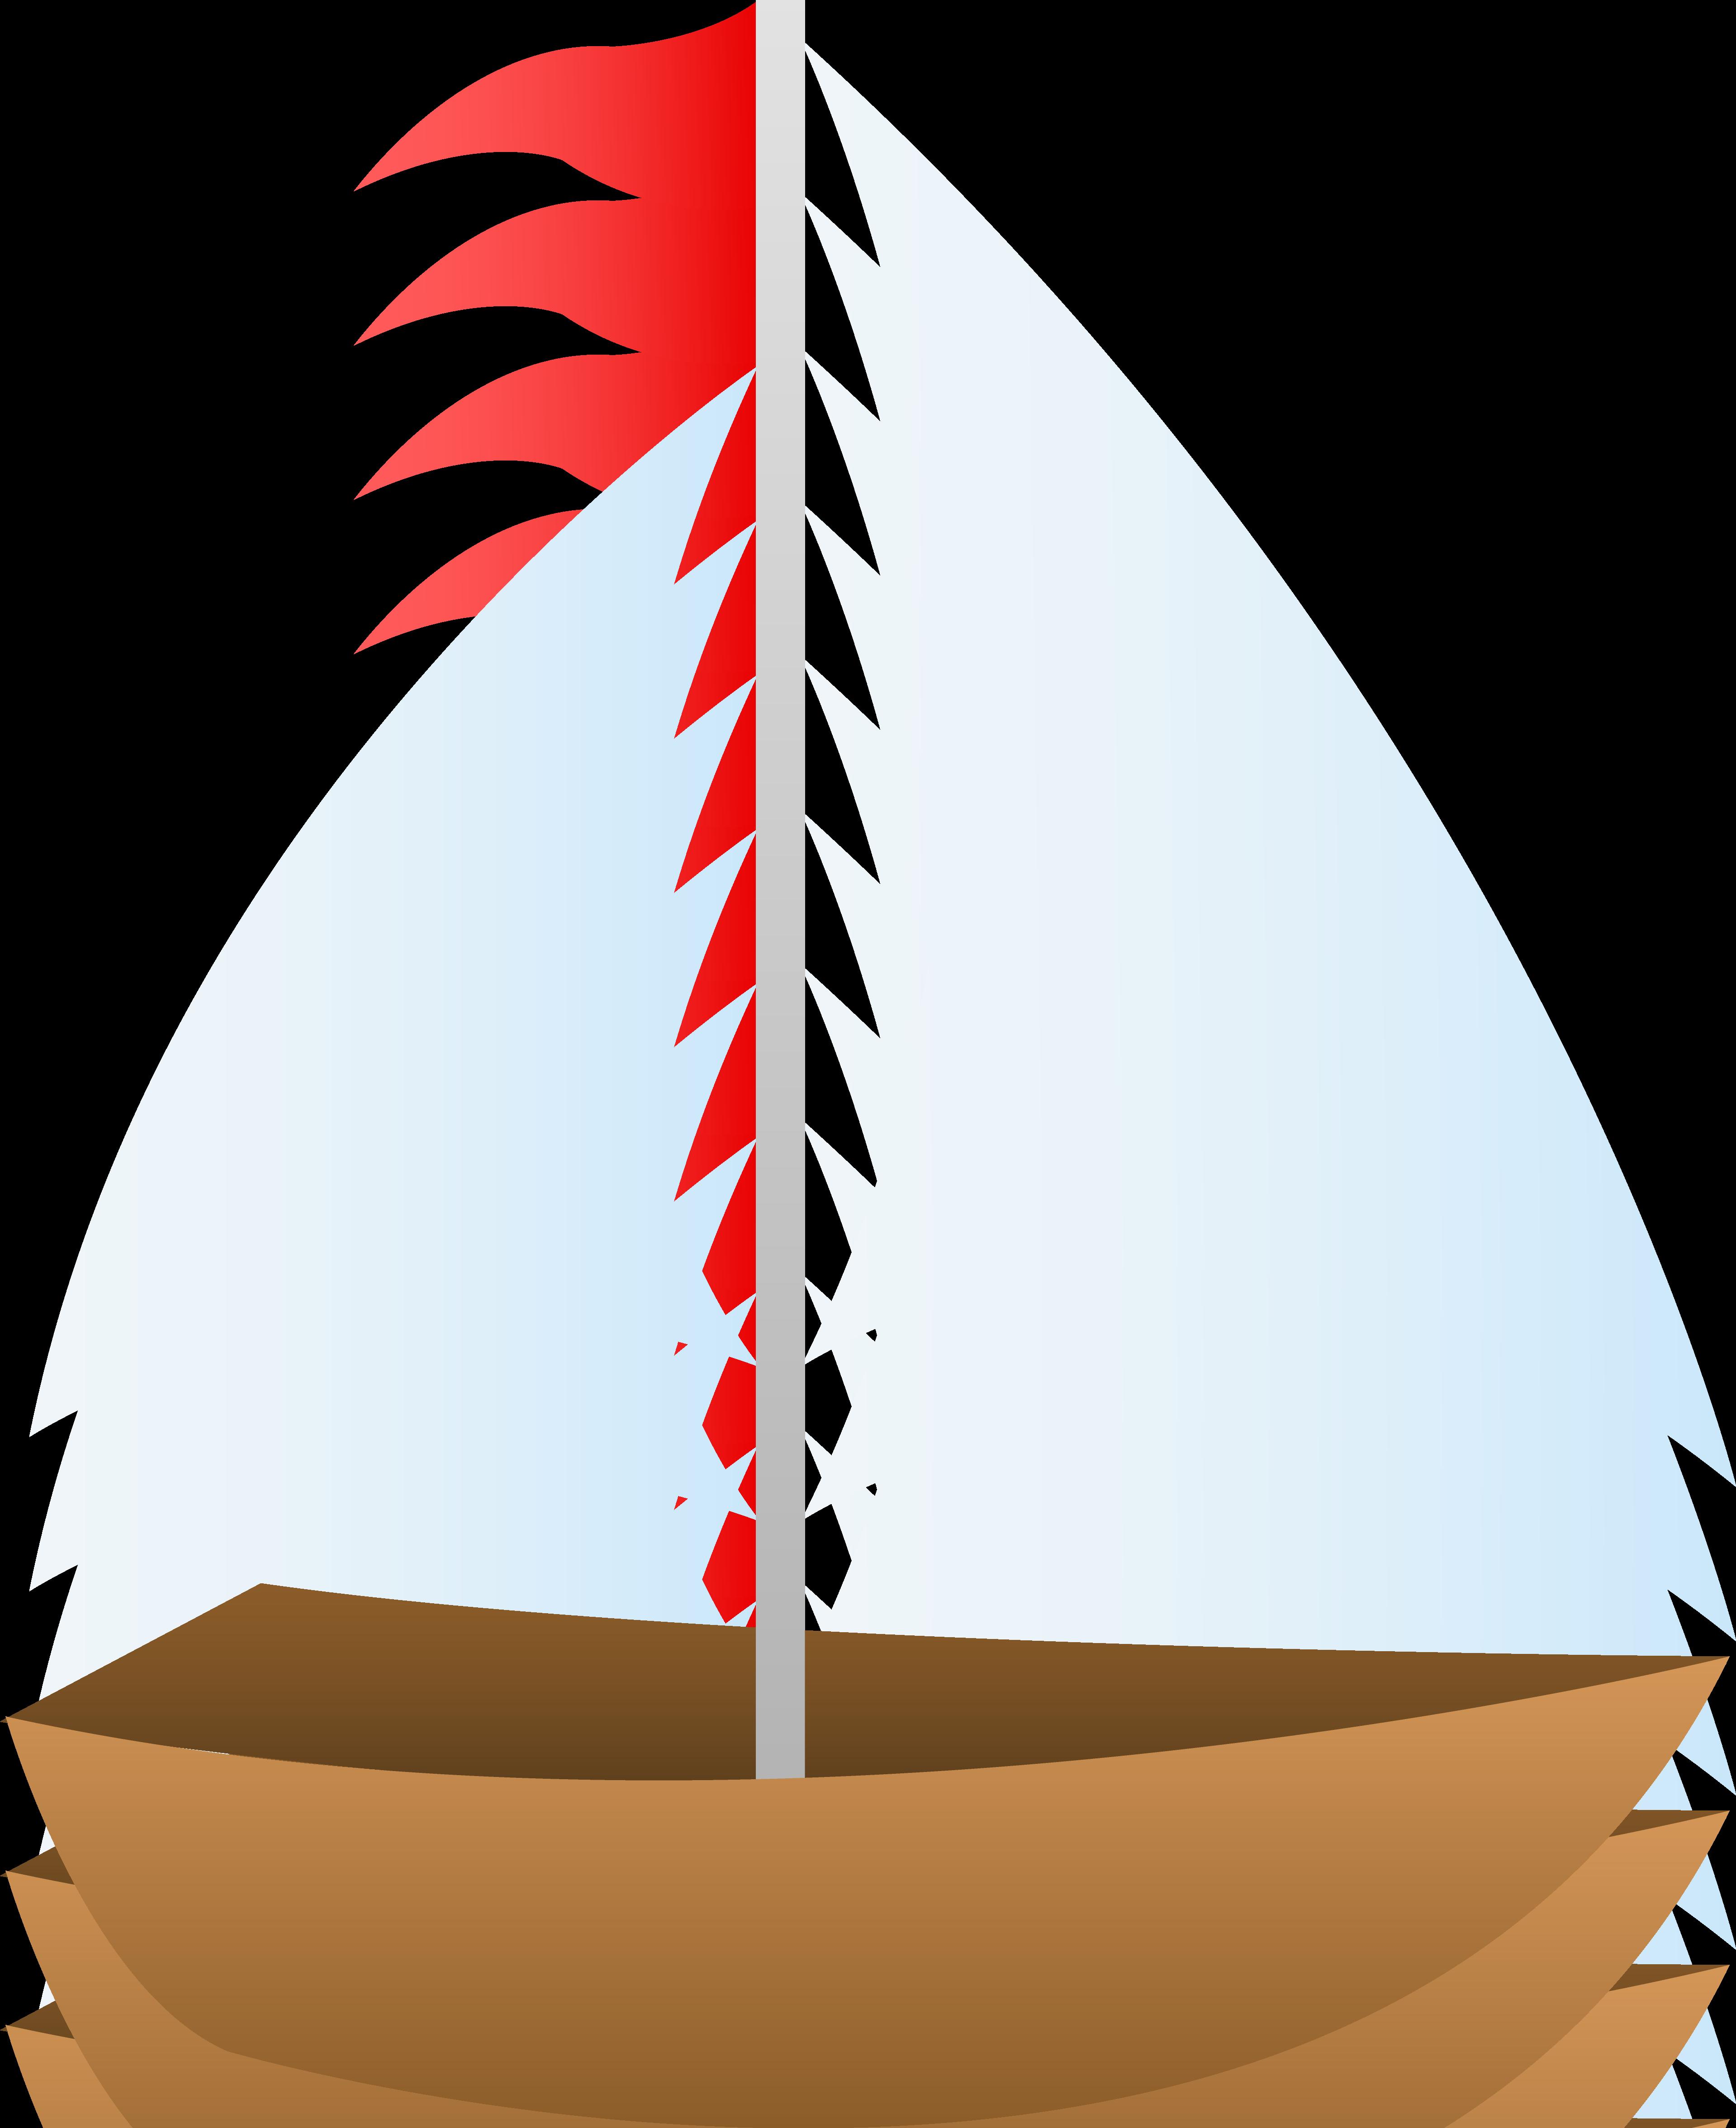 Red Sailboat Free Clipart-Red Sailboat Free Clipart-8